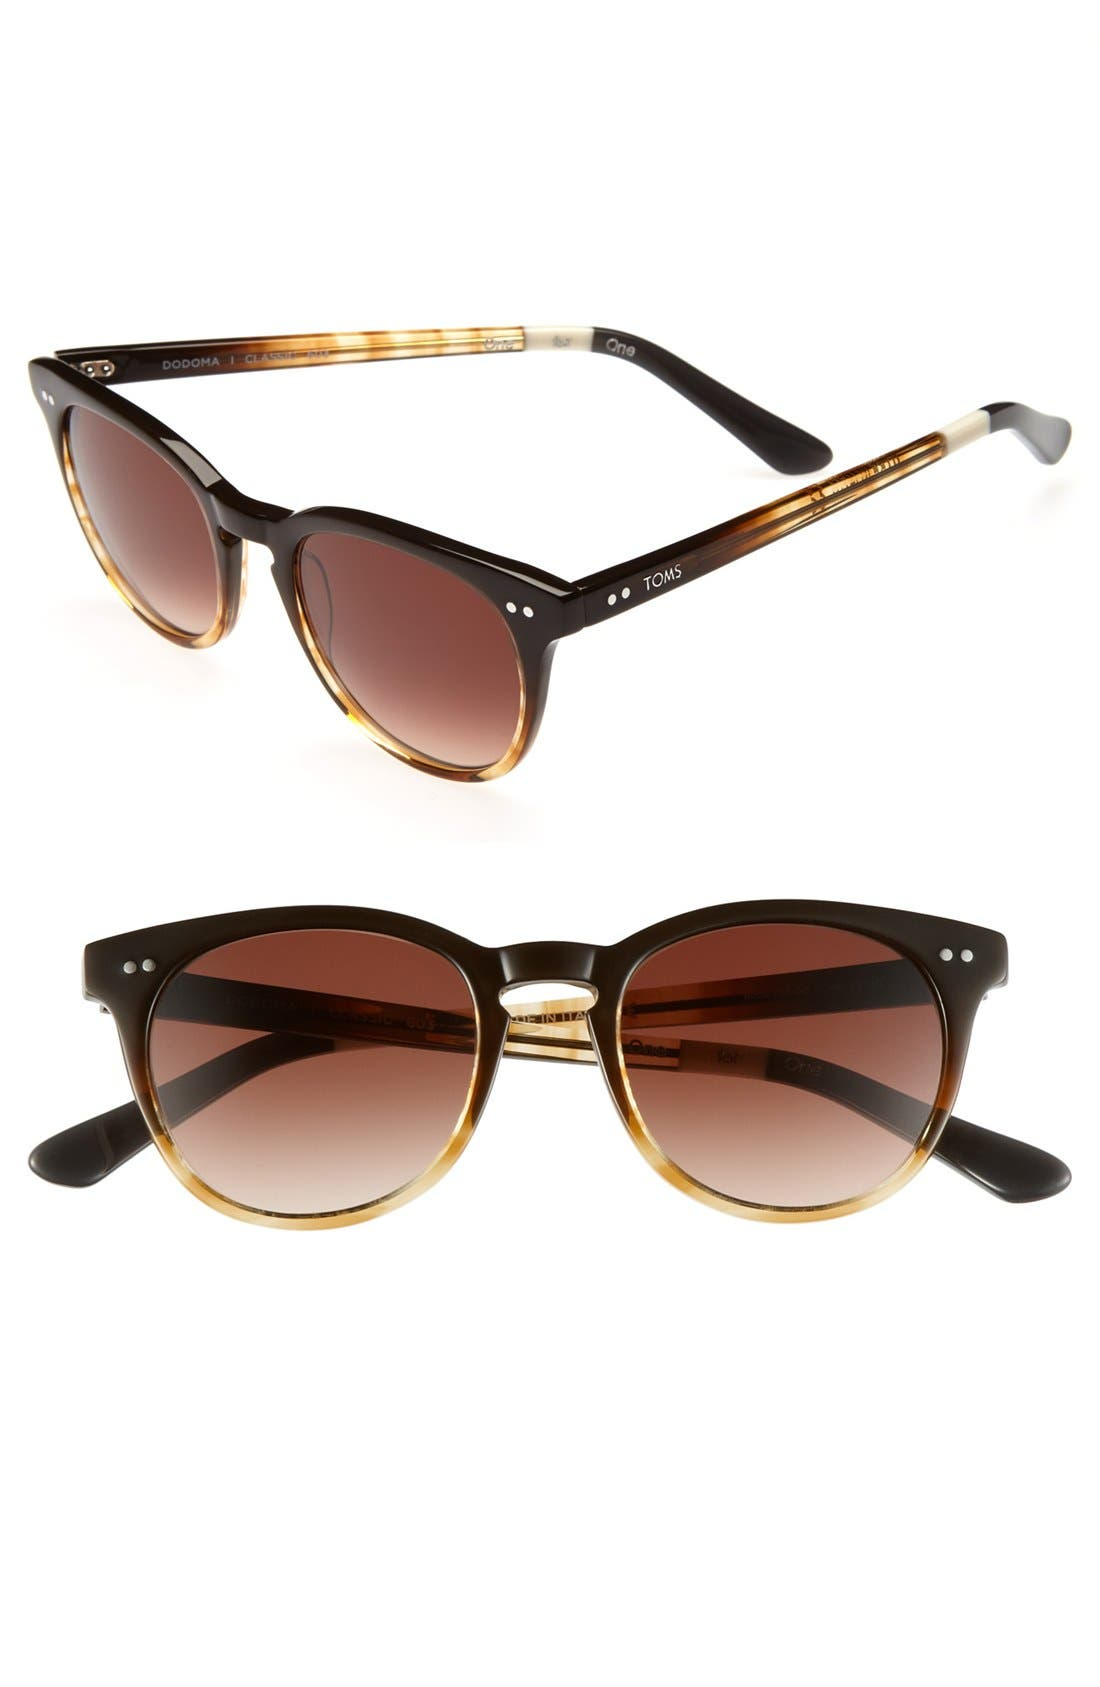 Main Image - TOMS 'Dodoma' 48mm Vintage Keyhole Sunglasses